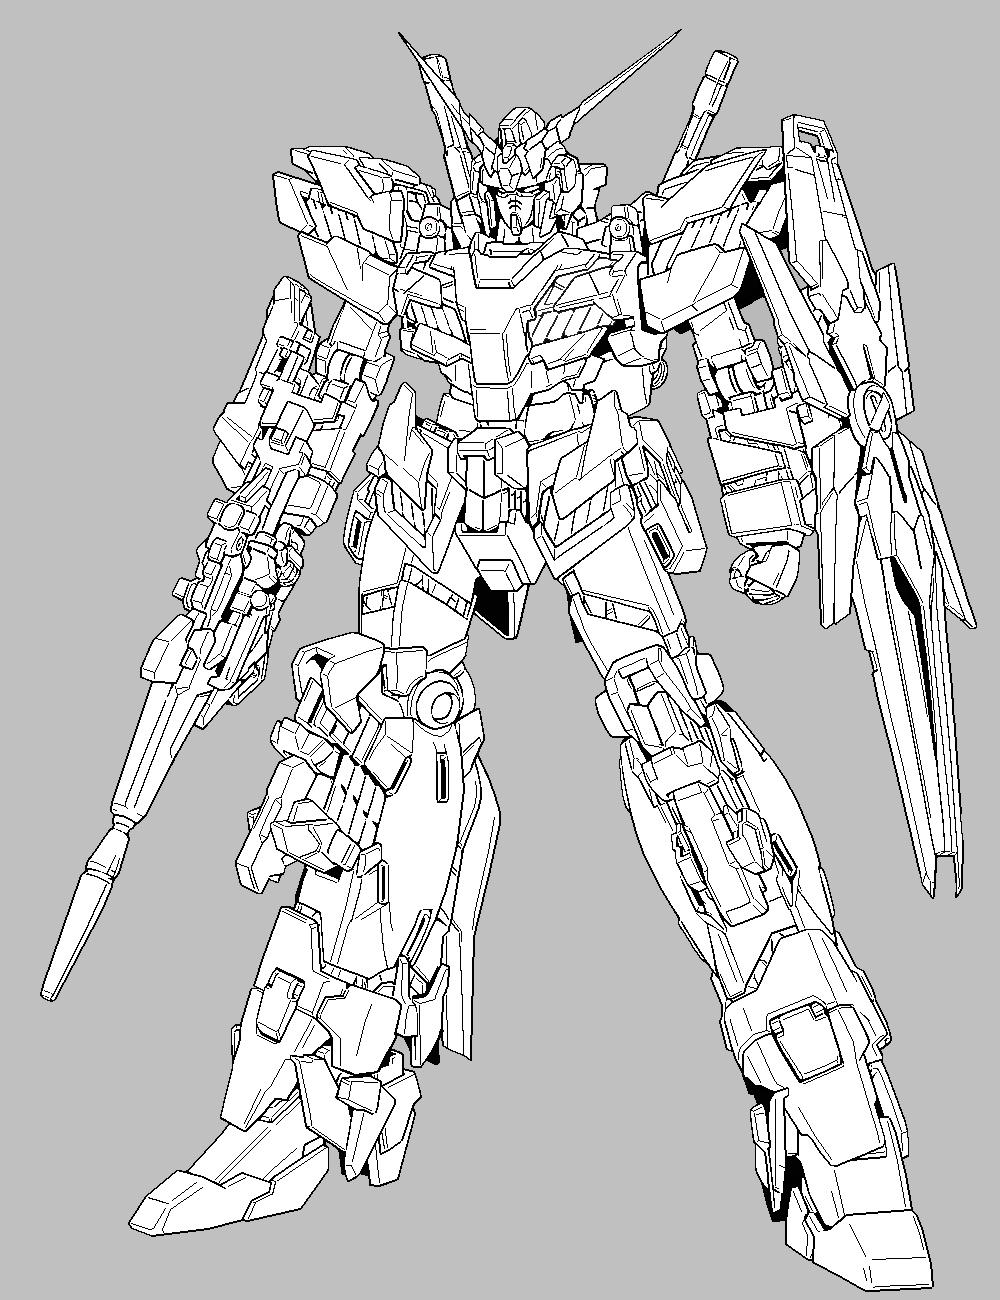 Layman's Gunpla Guide - Gundam Line Art Collection | Otaku ...